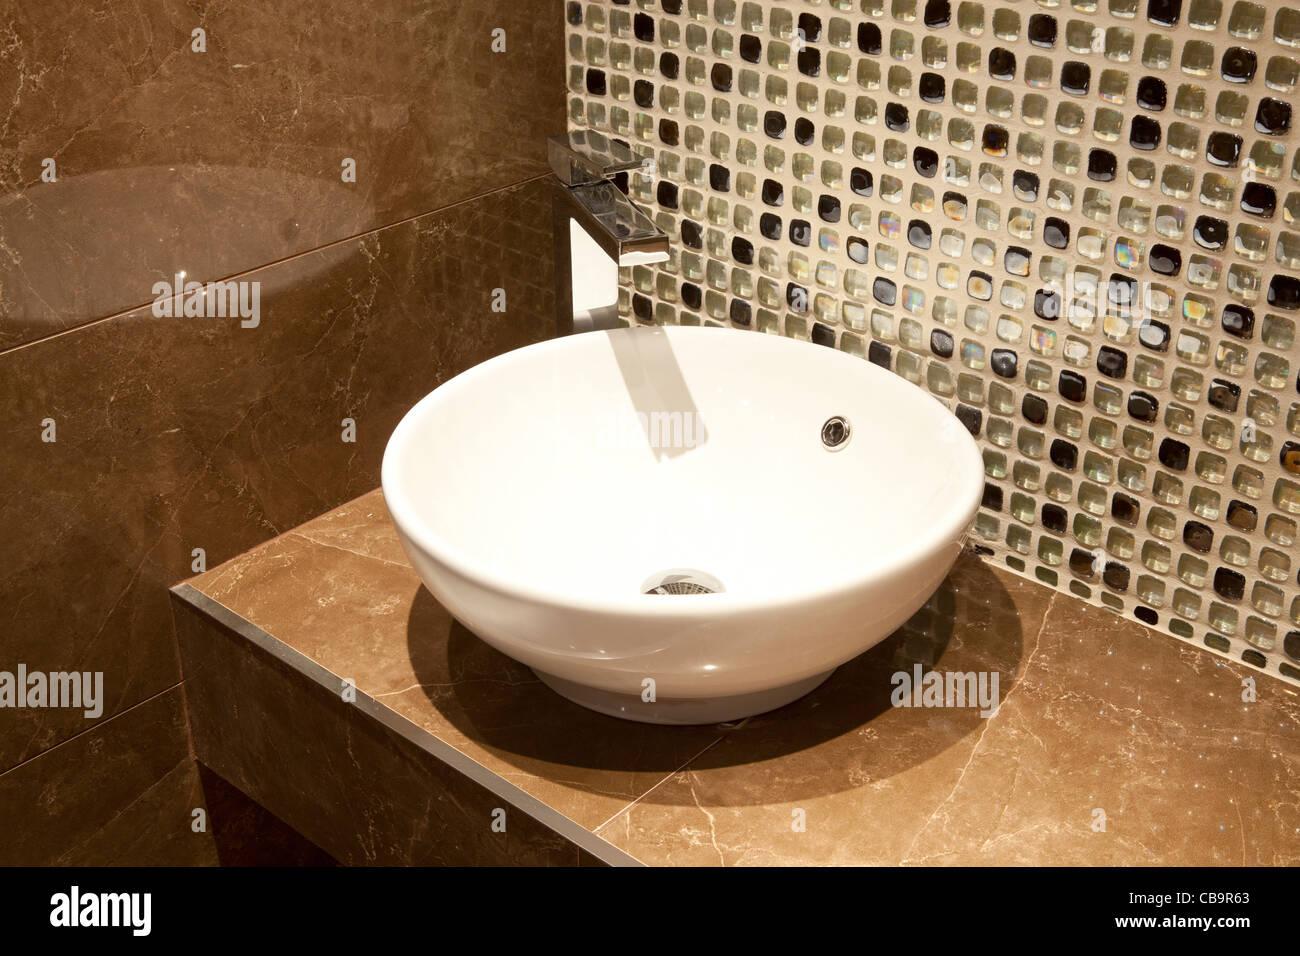 Circular white ceramic hand-basin in modern cloakroom - Stock Image